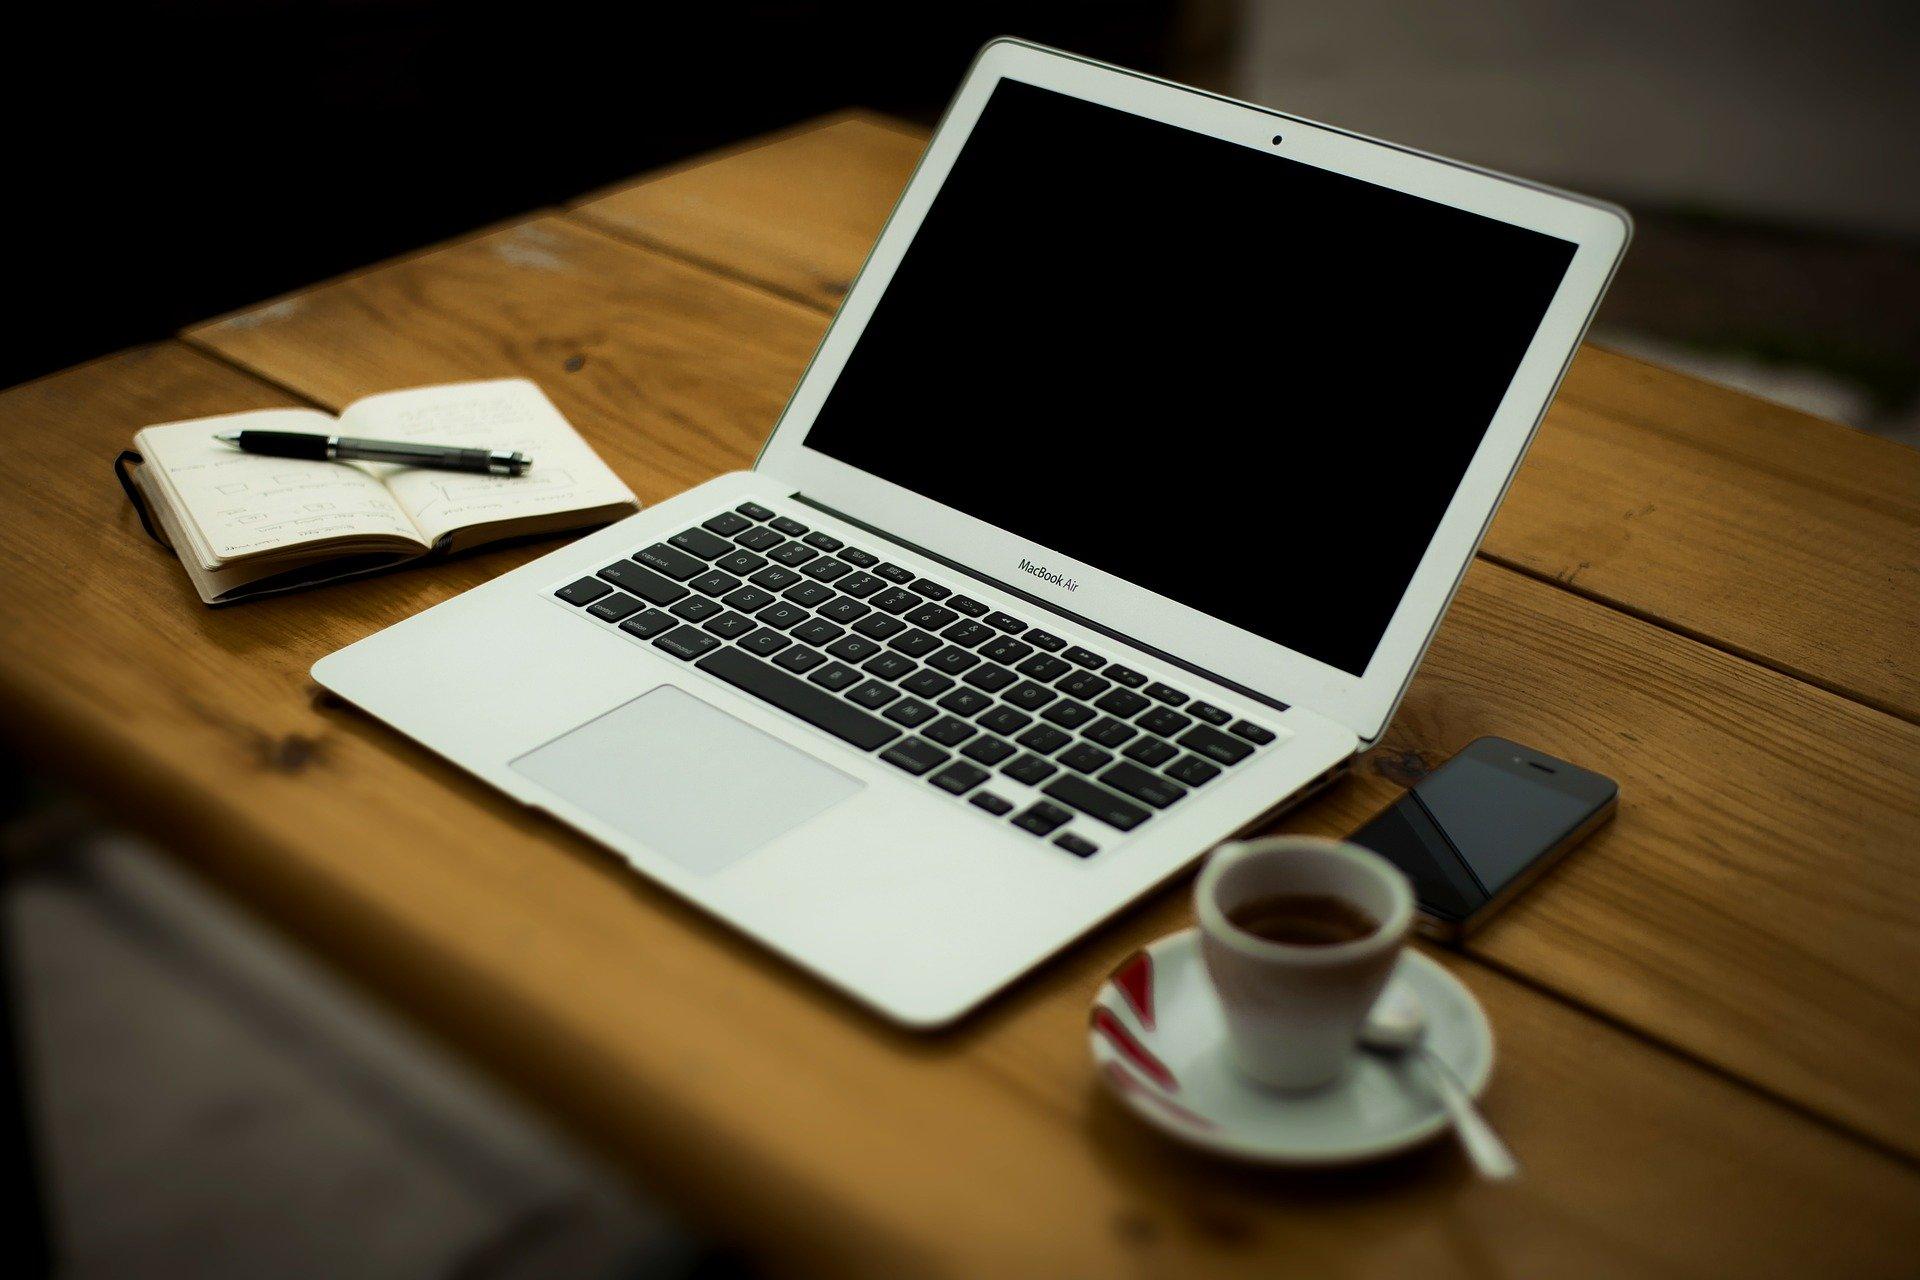 teaching-traditional-music-online-iTeachTrad--Liz- Doherty-laptop